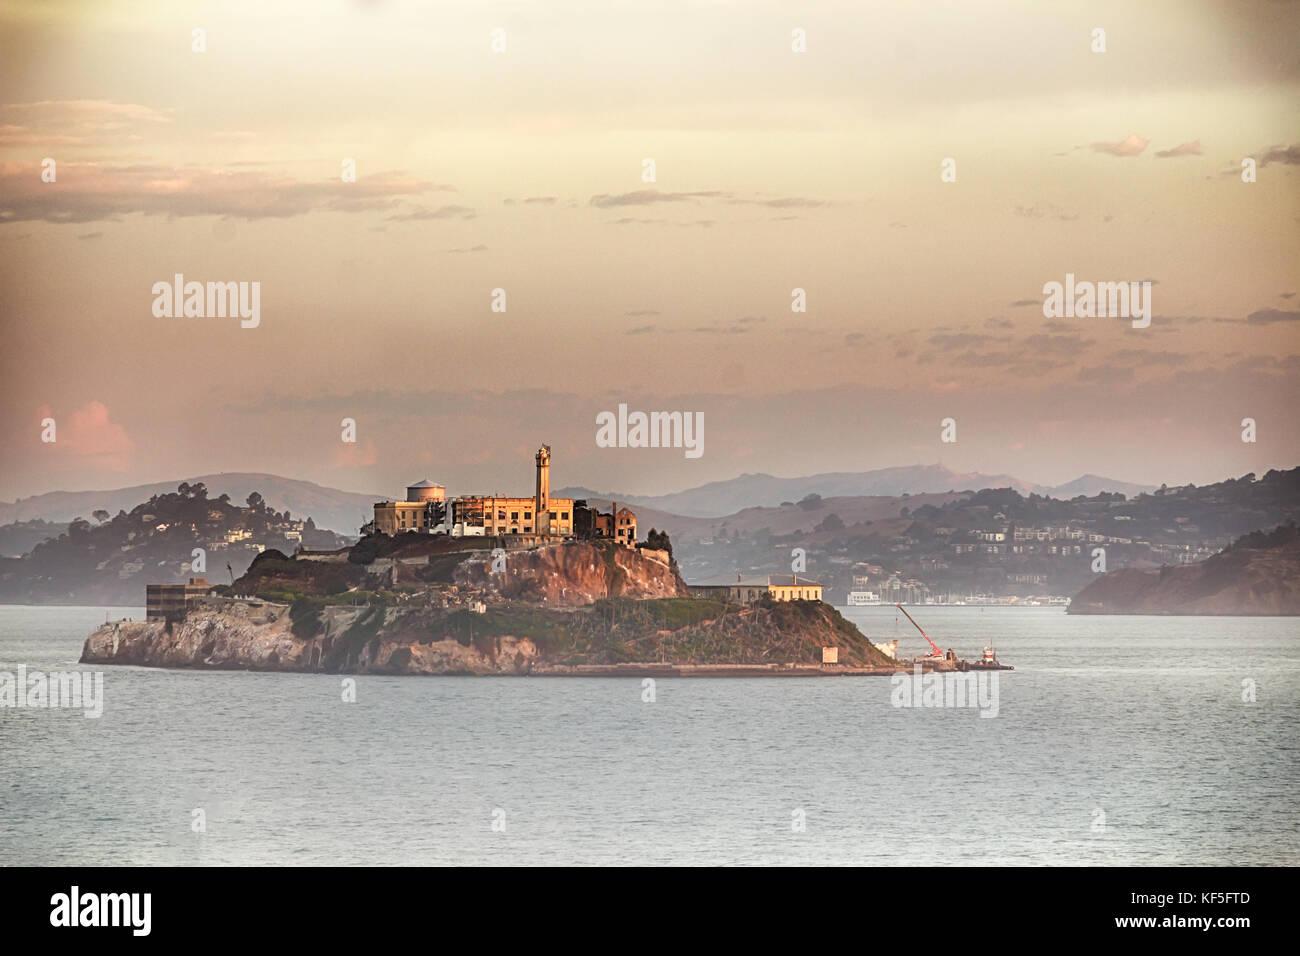 The Alcatraz Island in San Francisco, film retro style. Stock Photo